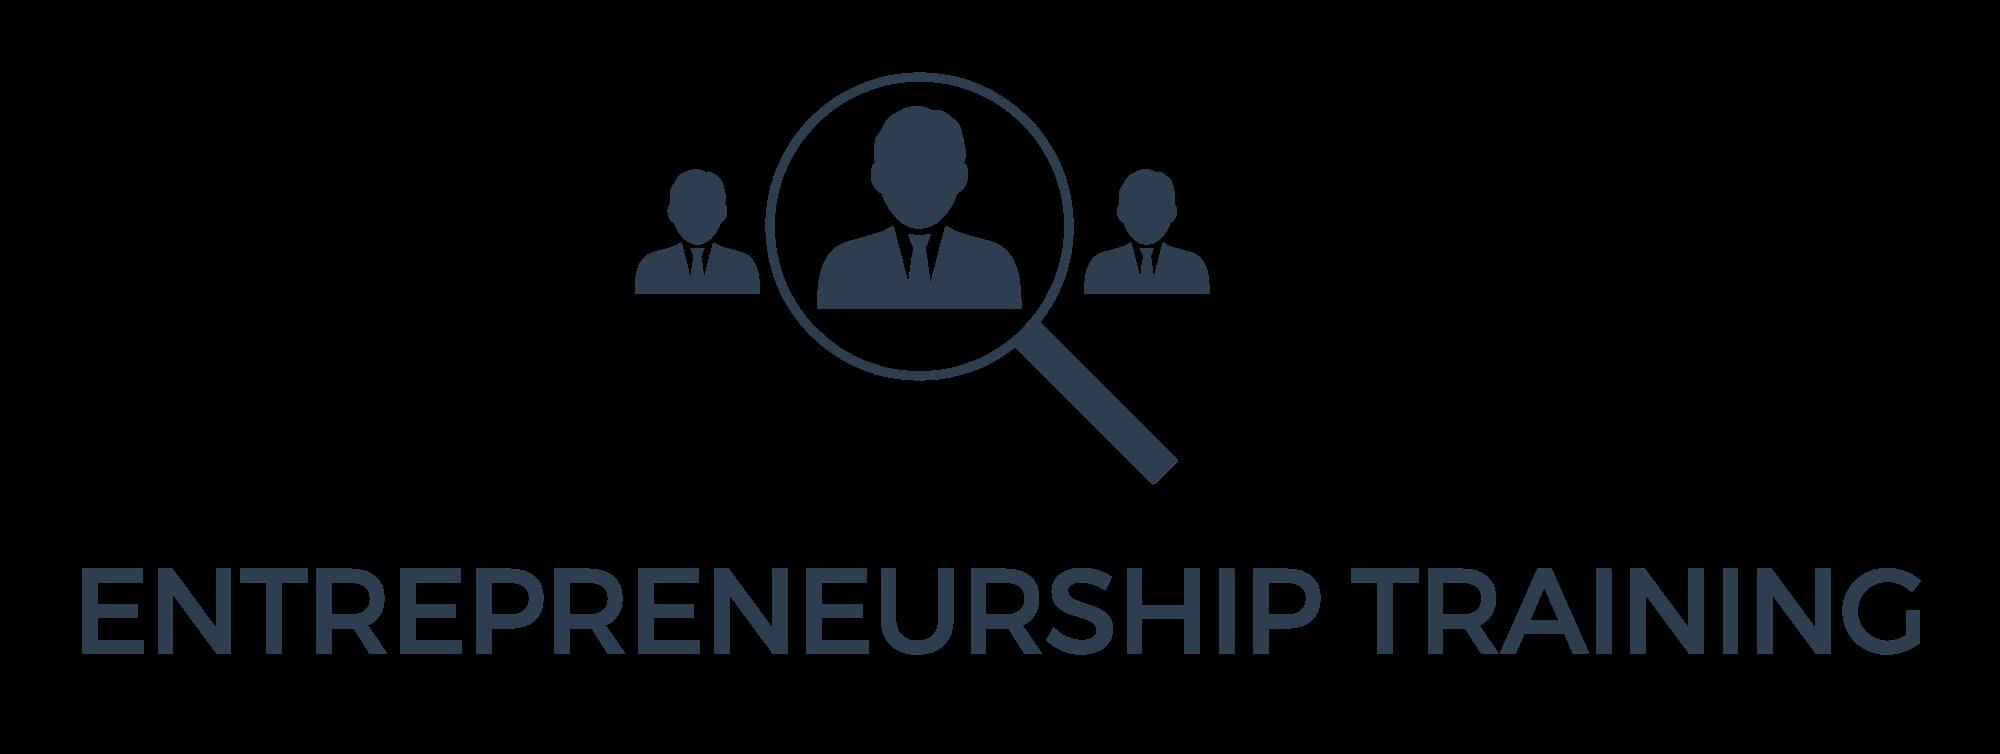 24/7 Learning Academy Summer Camp Entrepreneurship Training